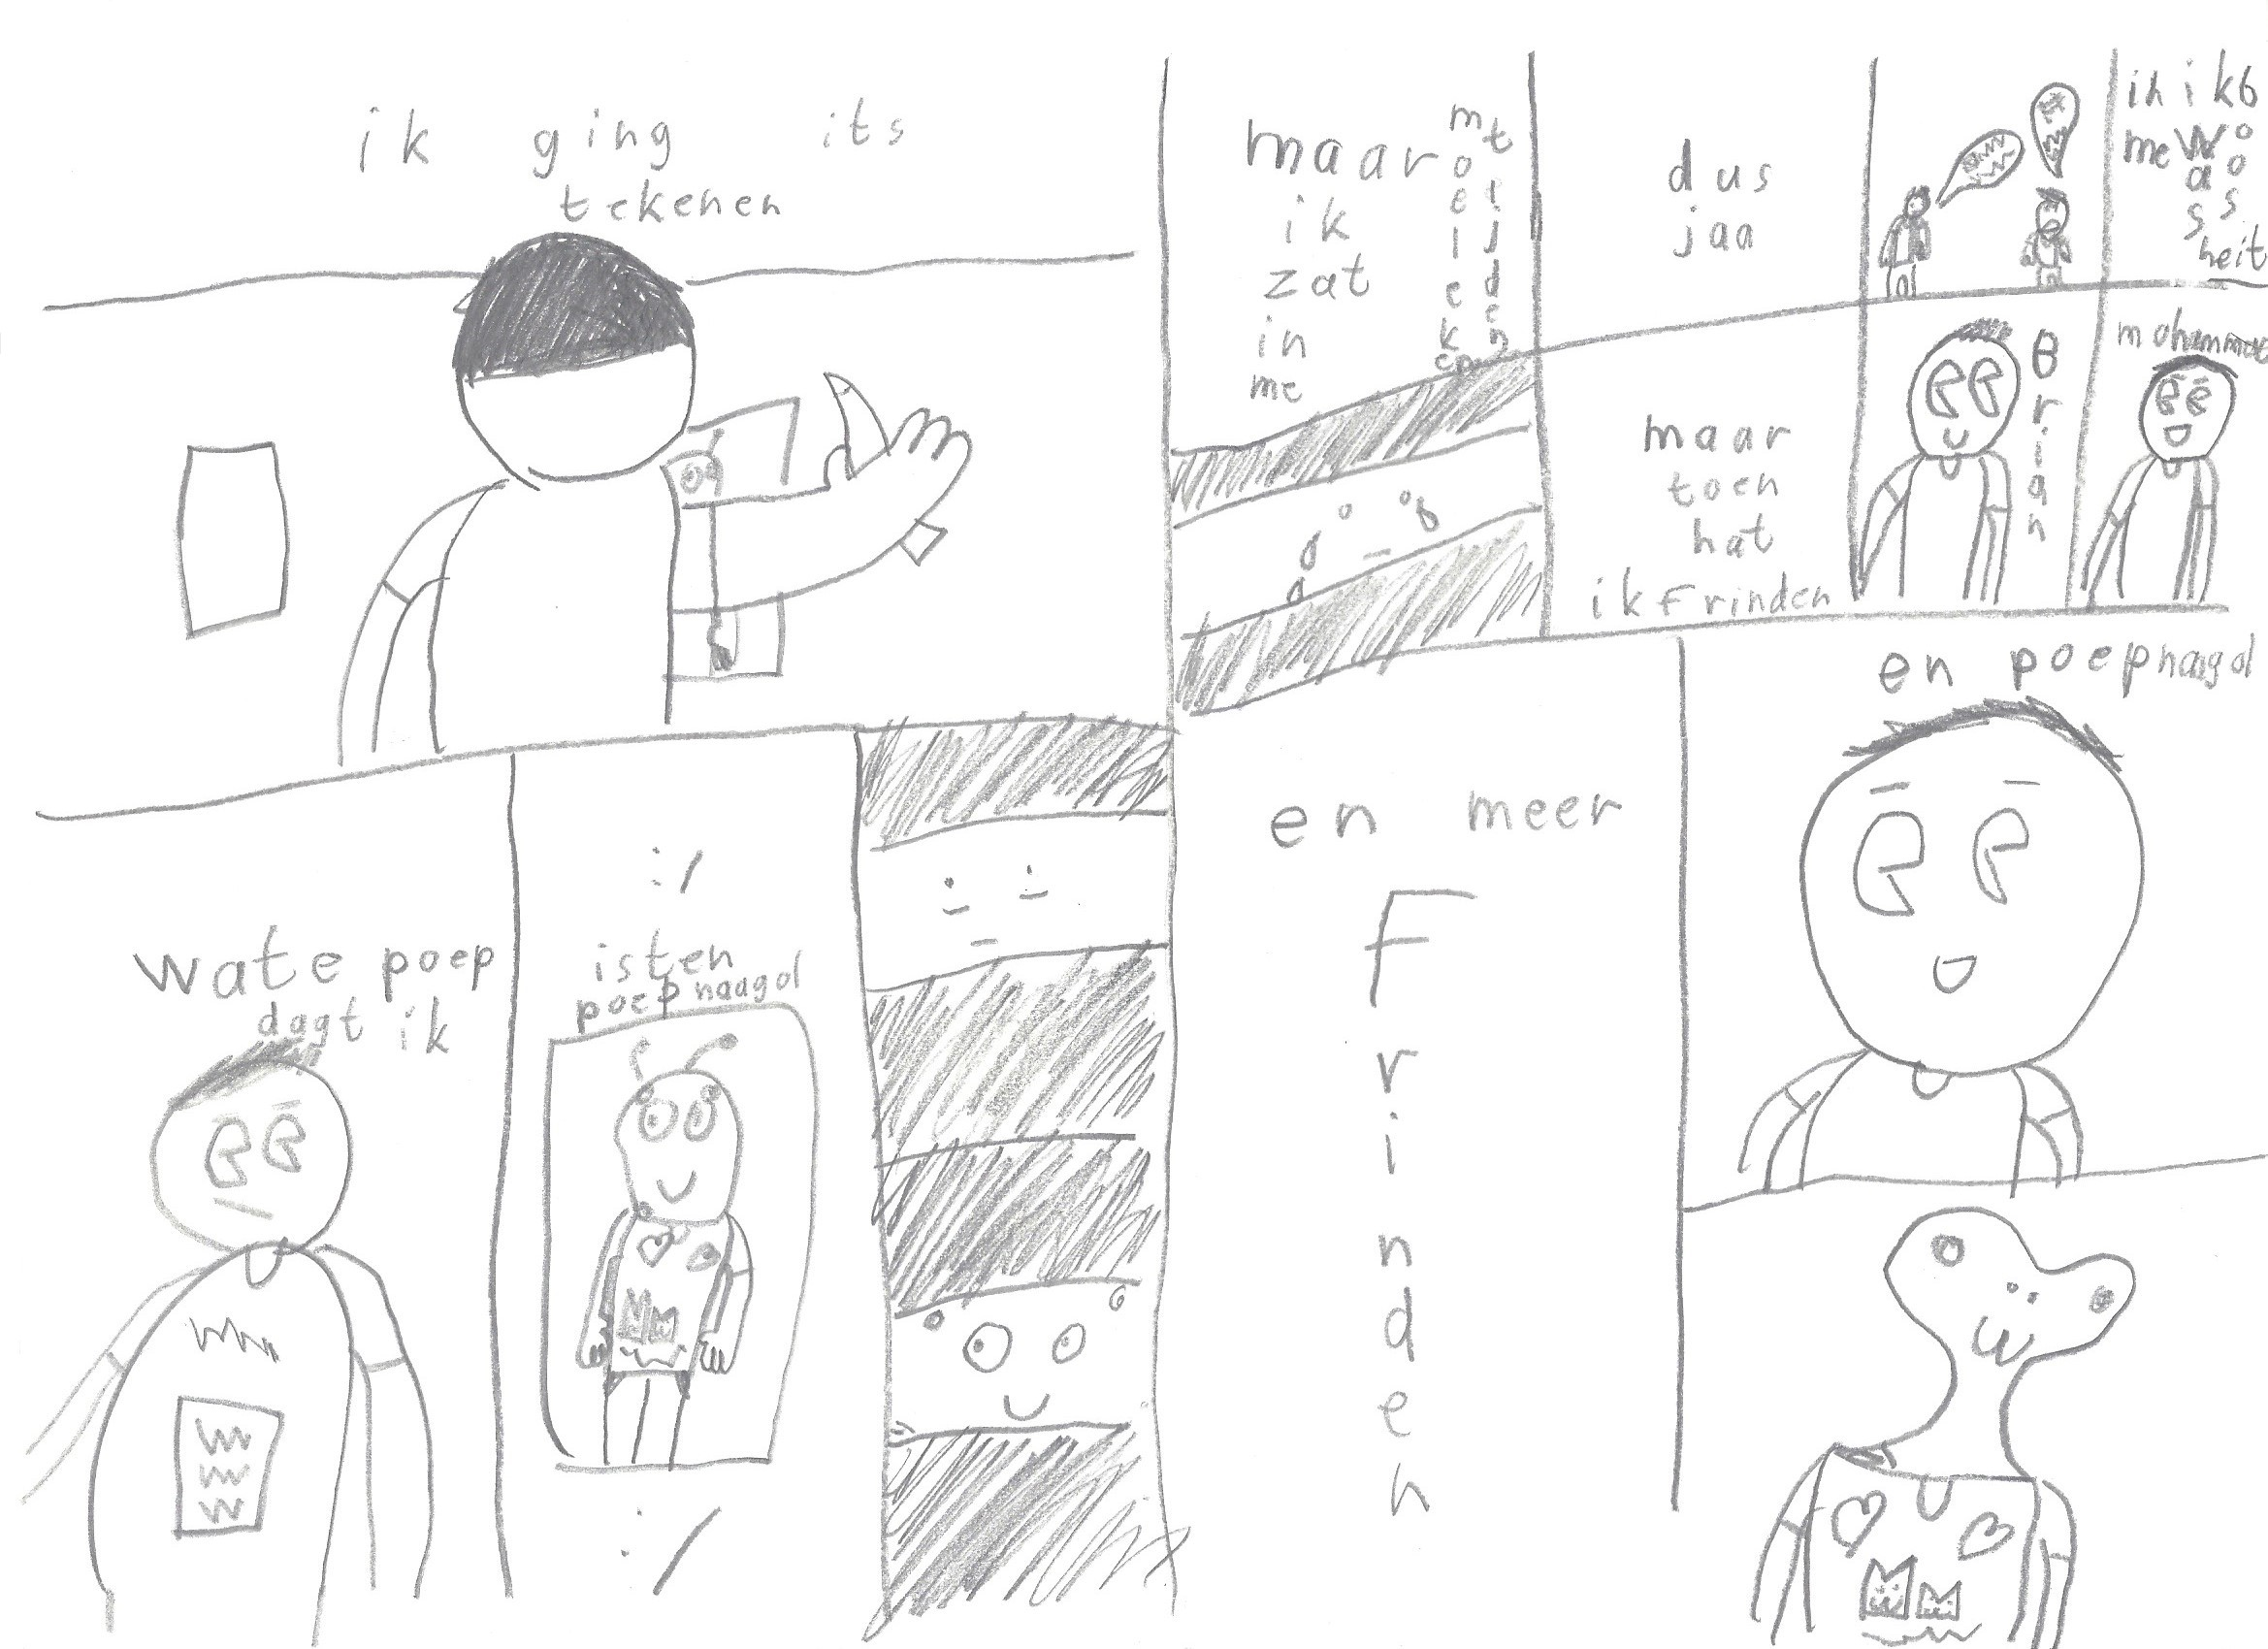 Poepnaagol 19 pagina 2-3